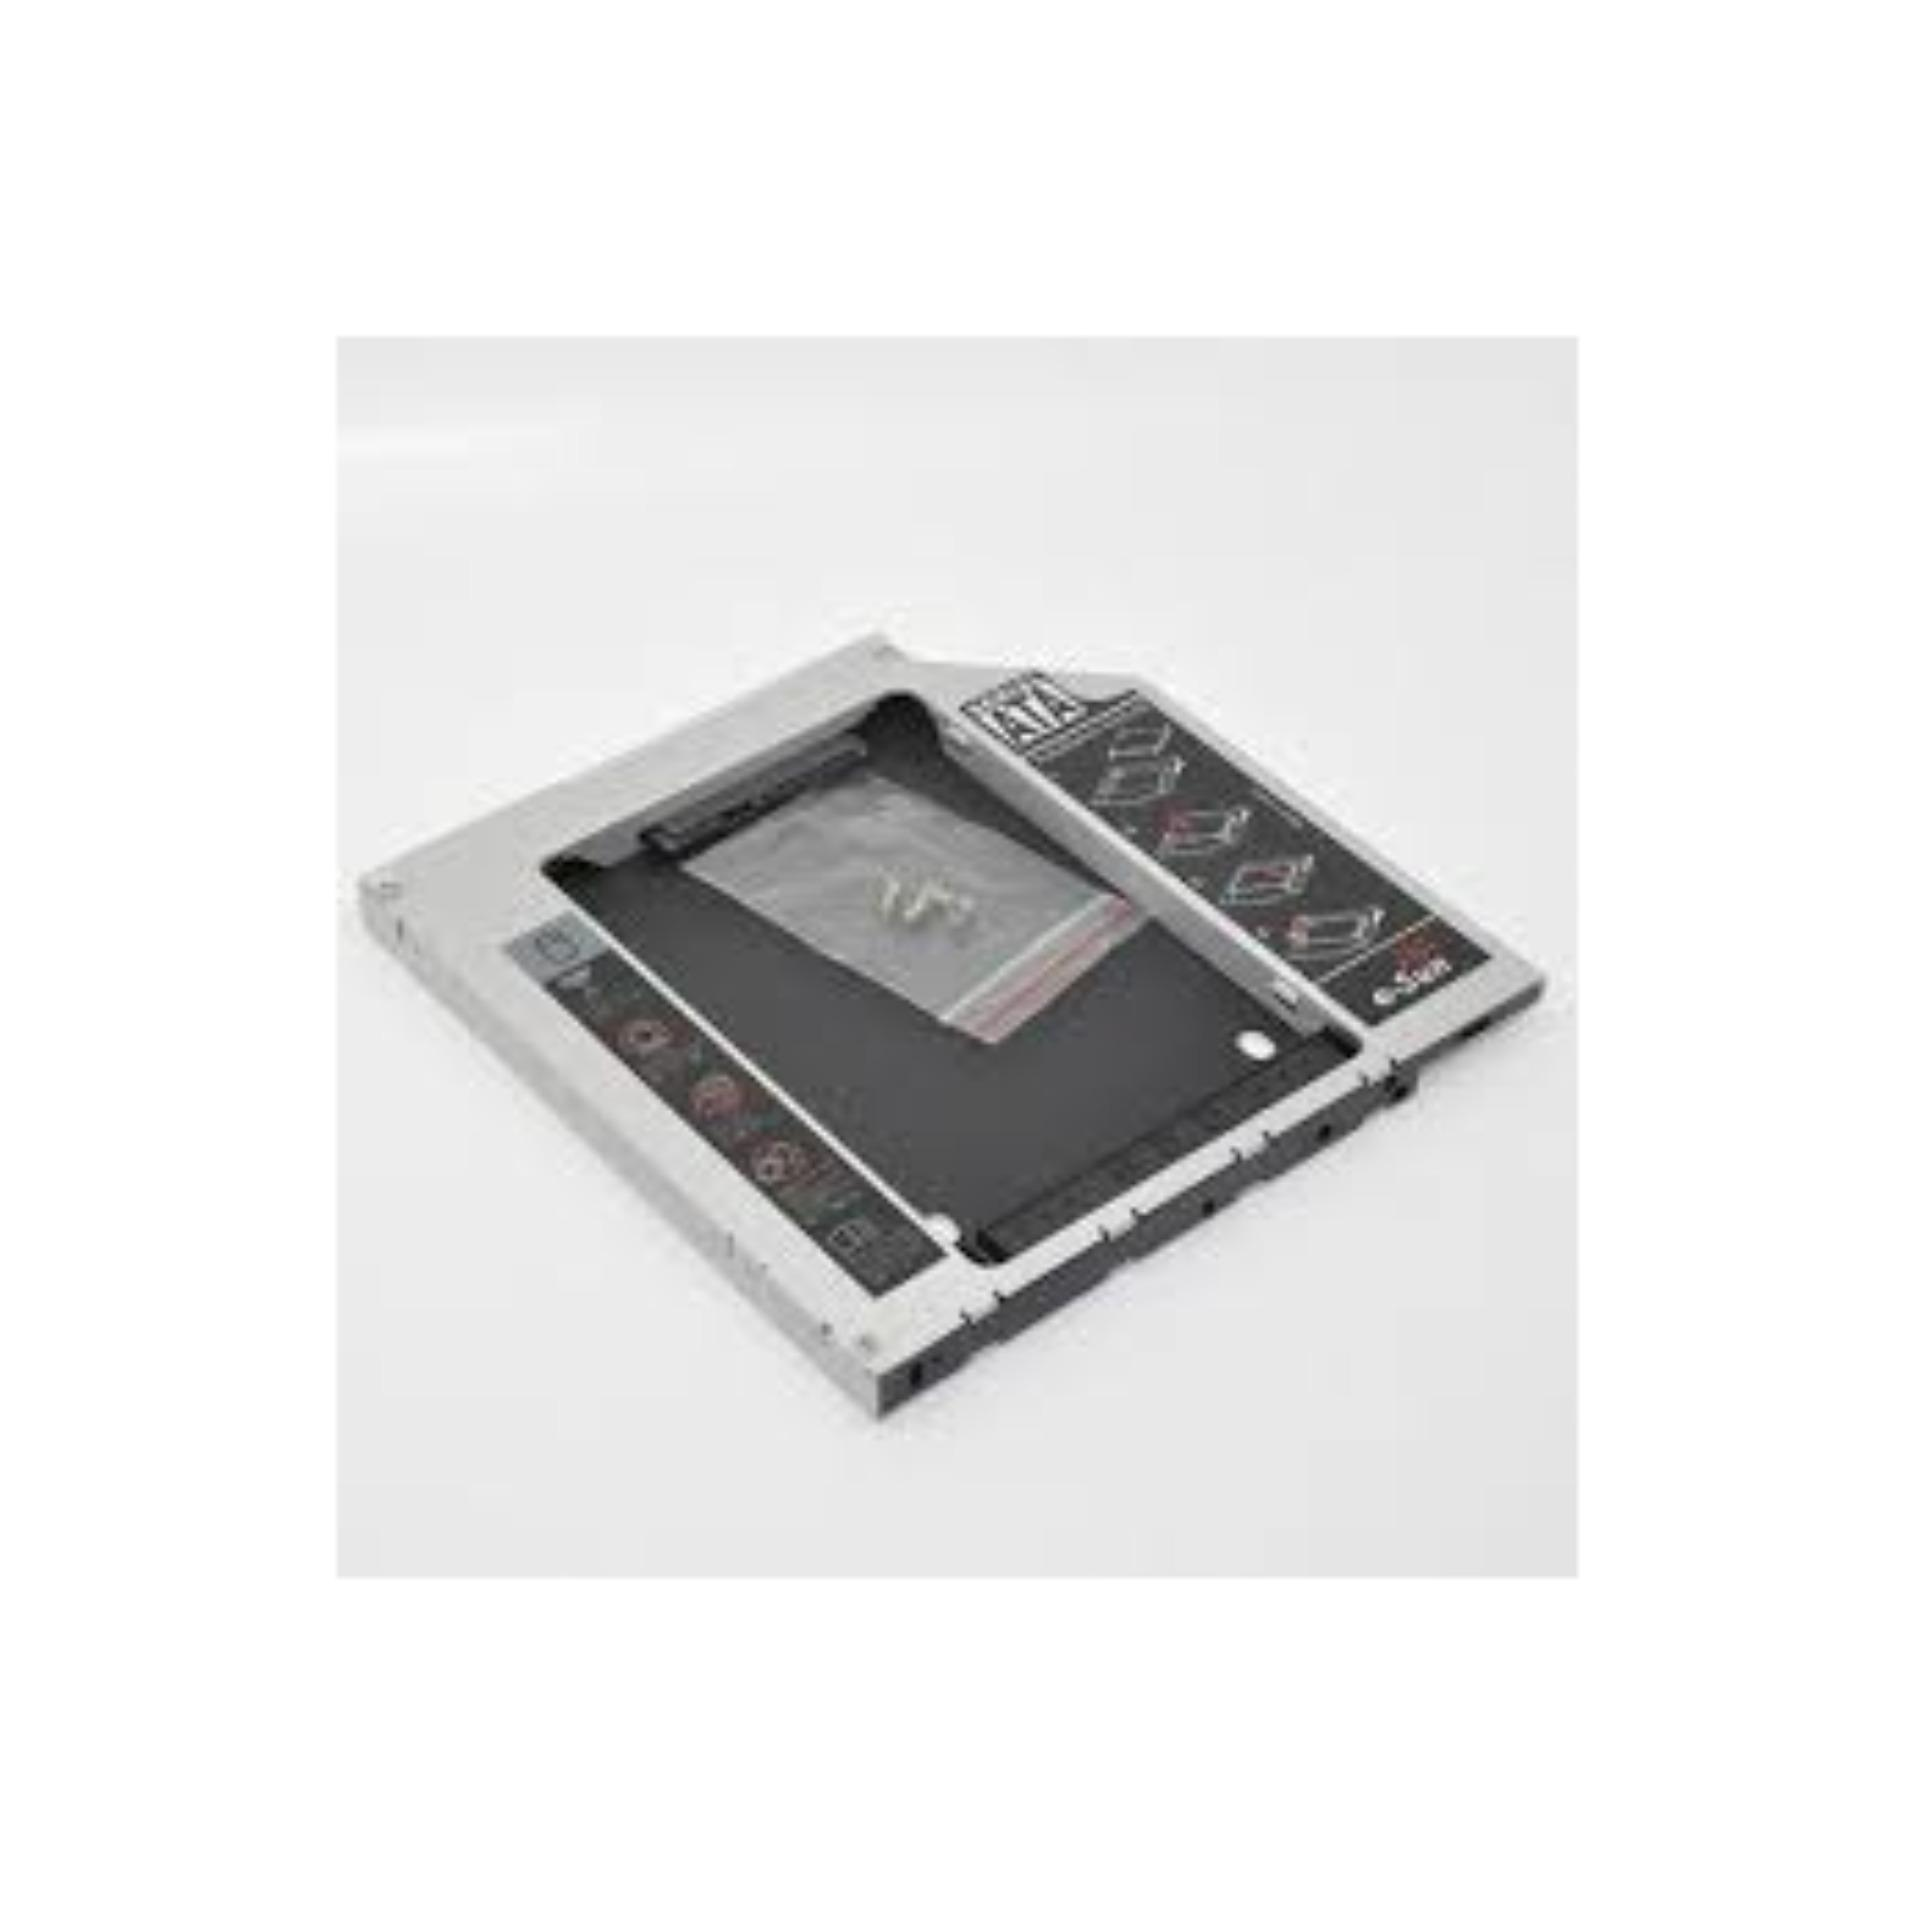 "HDD CaddyBay 2.5"" Sata 9.5mm (Chuyển ổ CD Laptop ra HDD)"